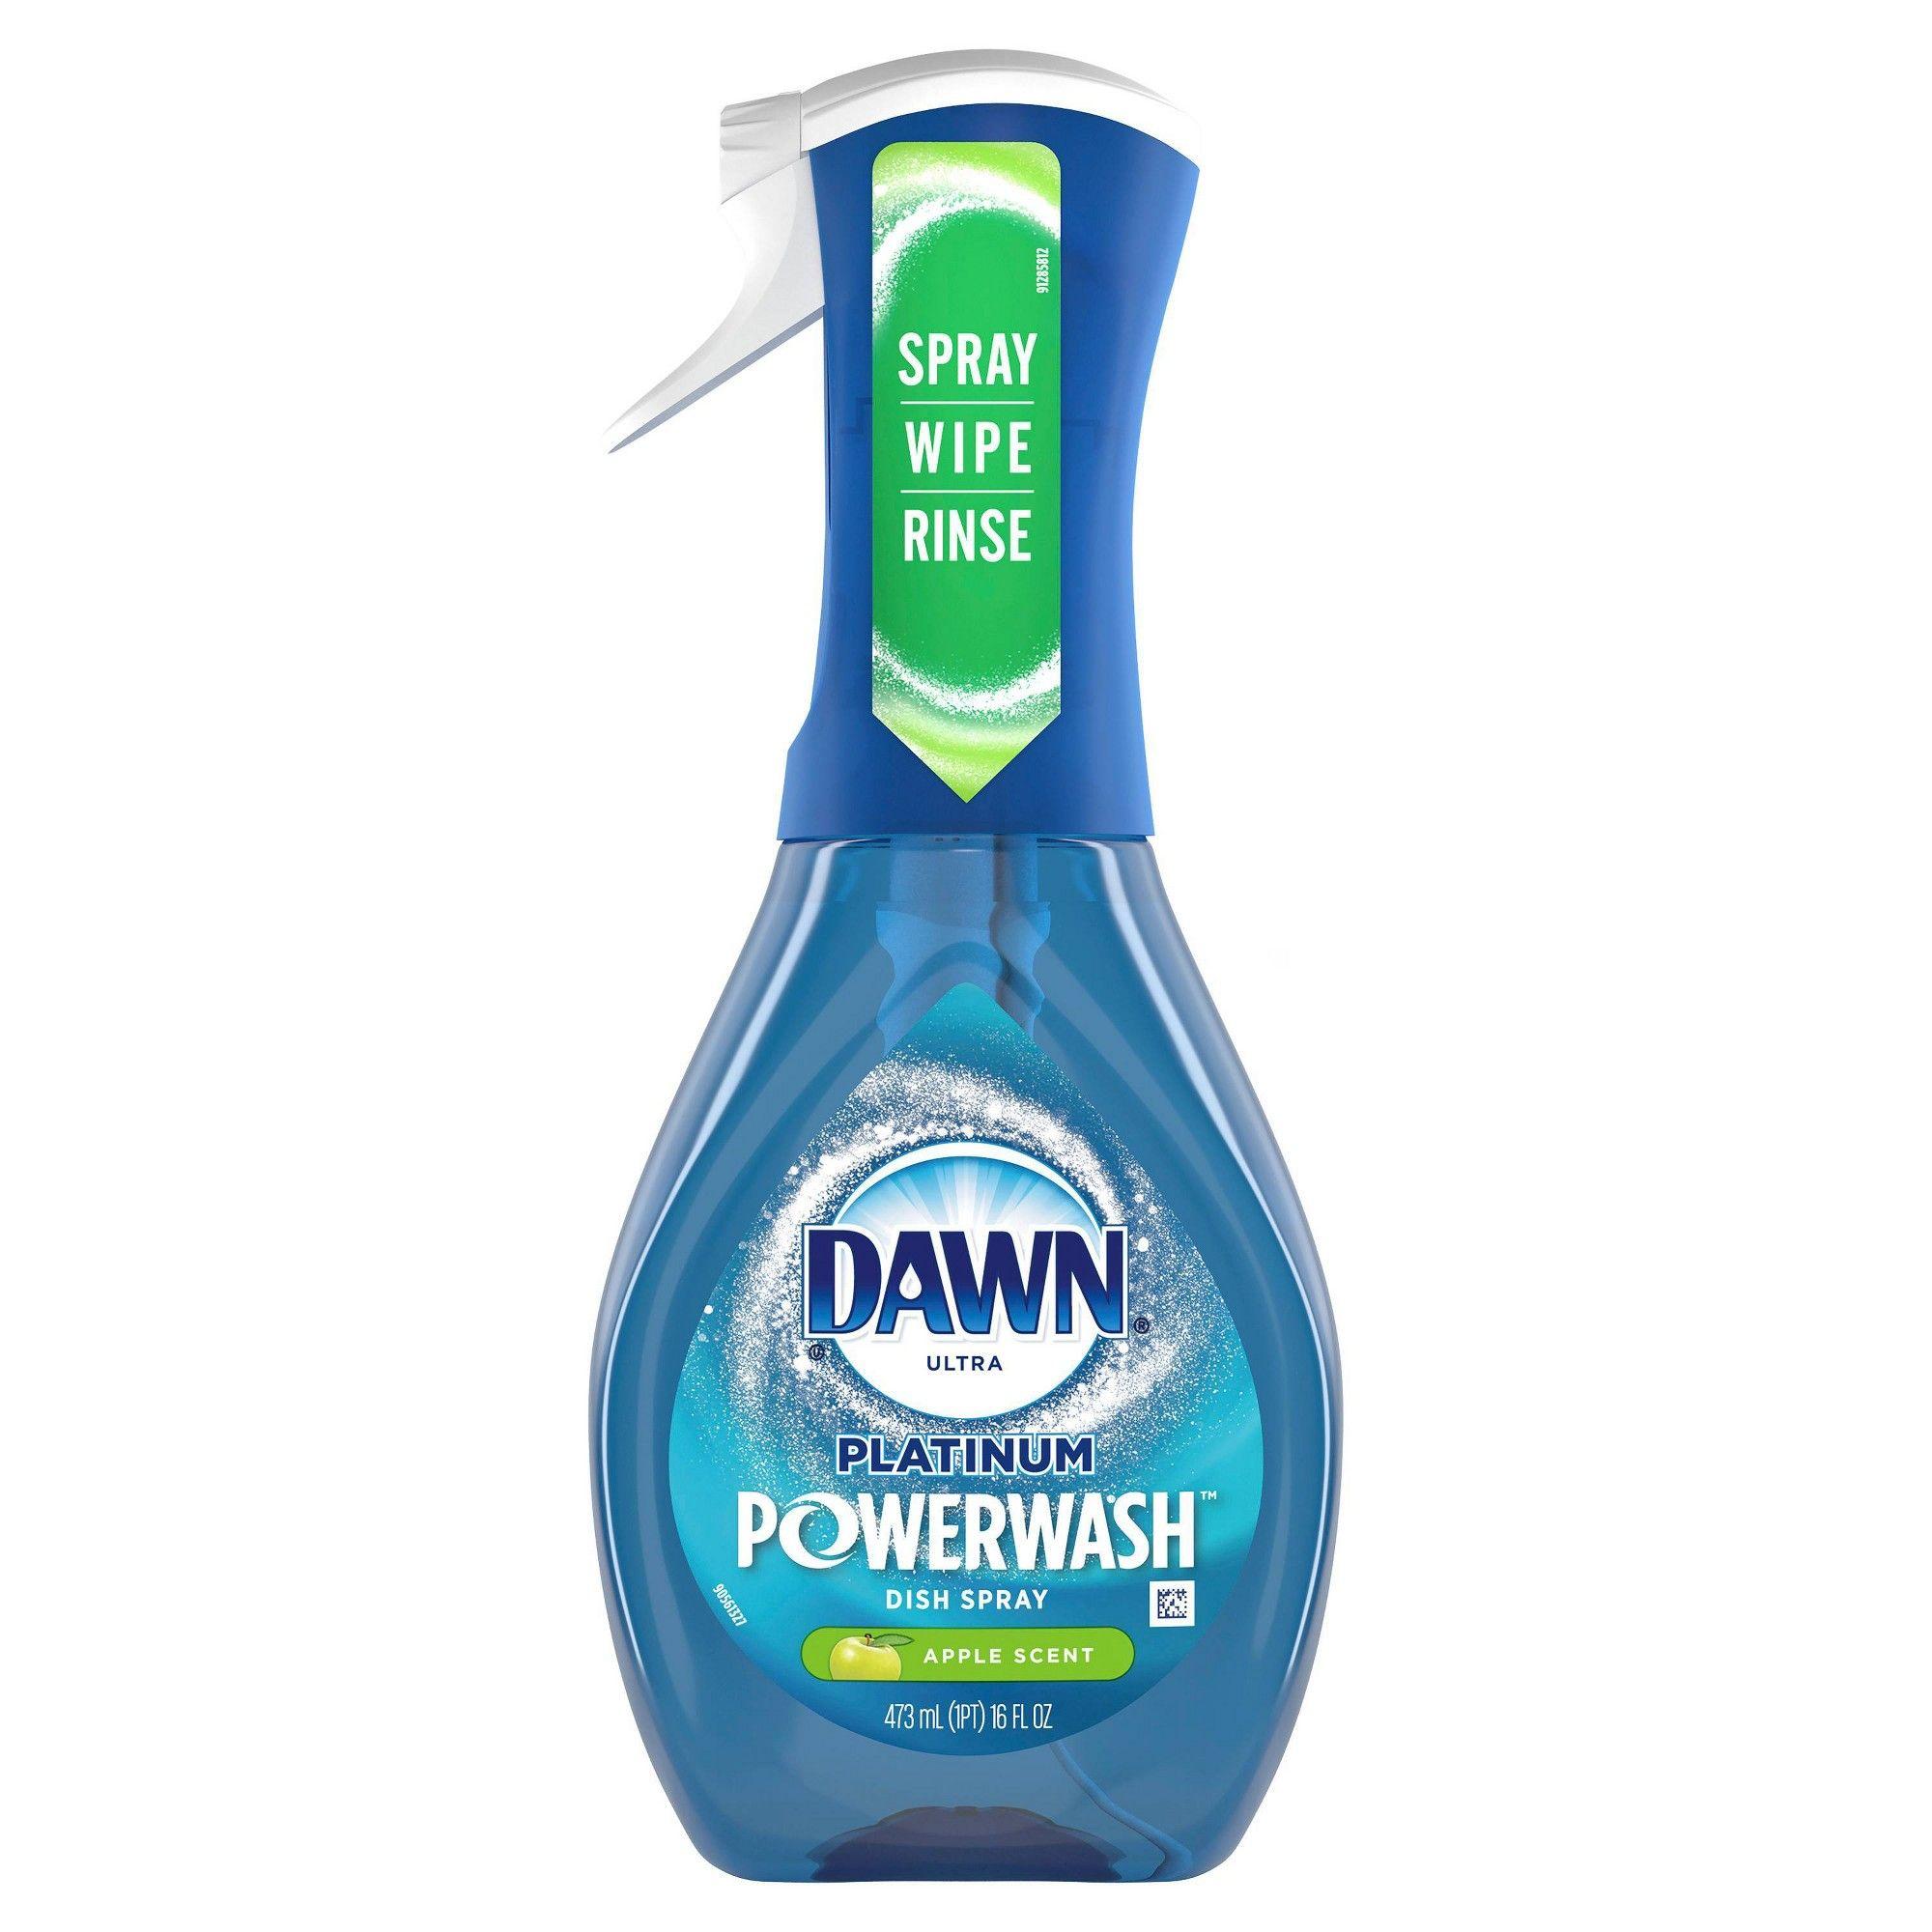 Dawn Platinum Powerwash Dish Spray Dish Soap Apple Scent 16